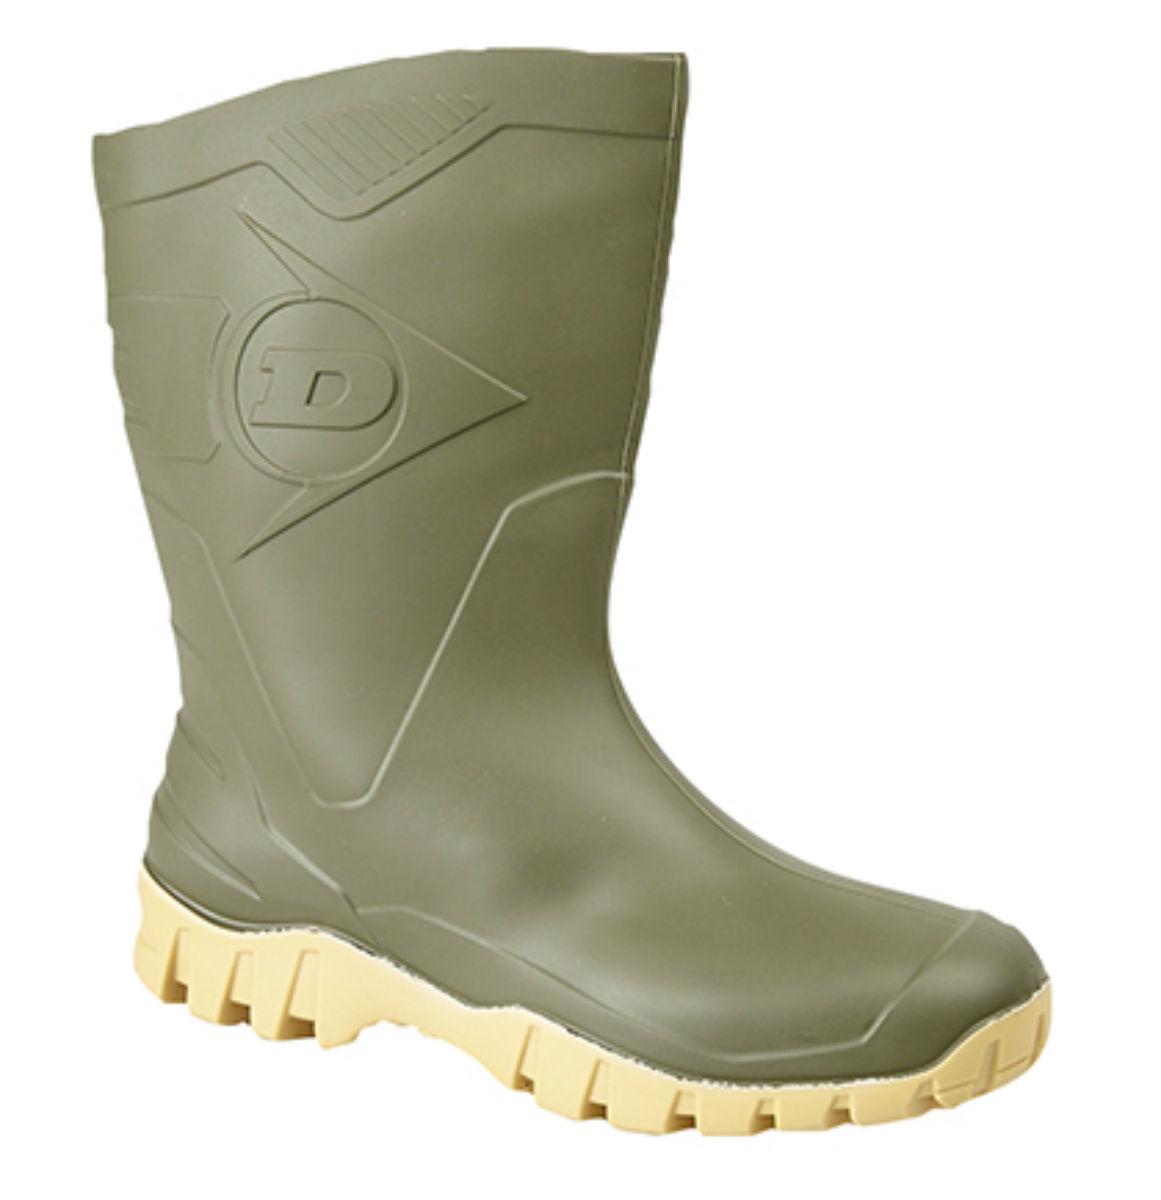 Mens/ladies Dunlop Dee widecalf wellies/wellingtons Negro O Verde Tallas 4 A 12